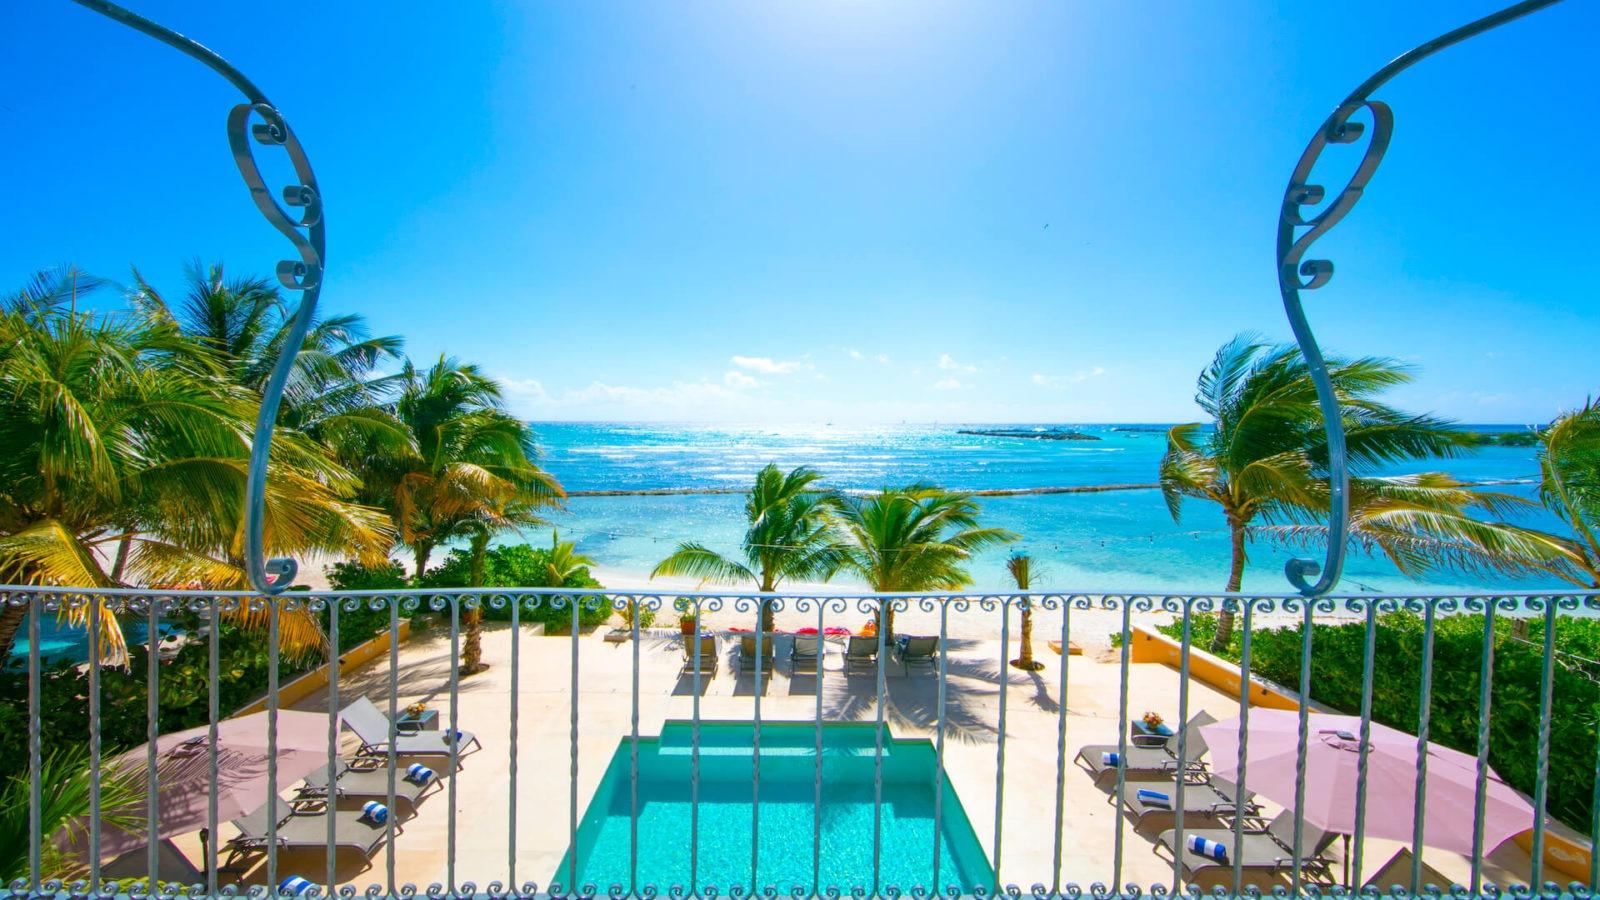 Rivera Maya private villa 1-balconey view